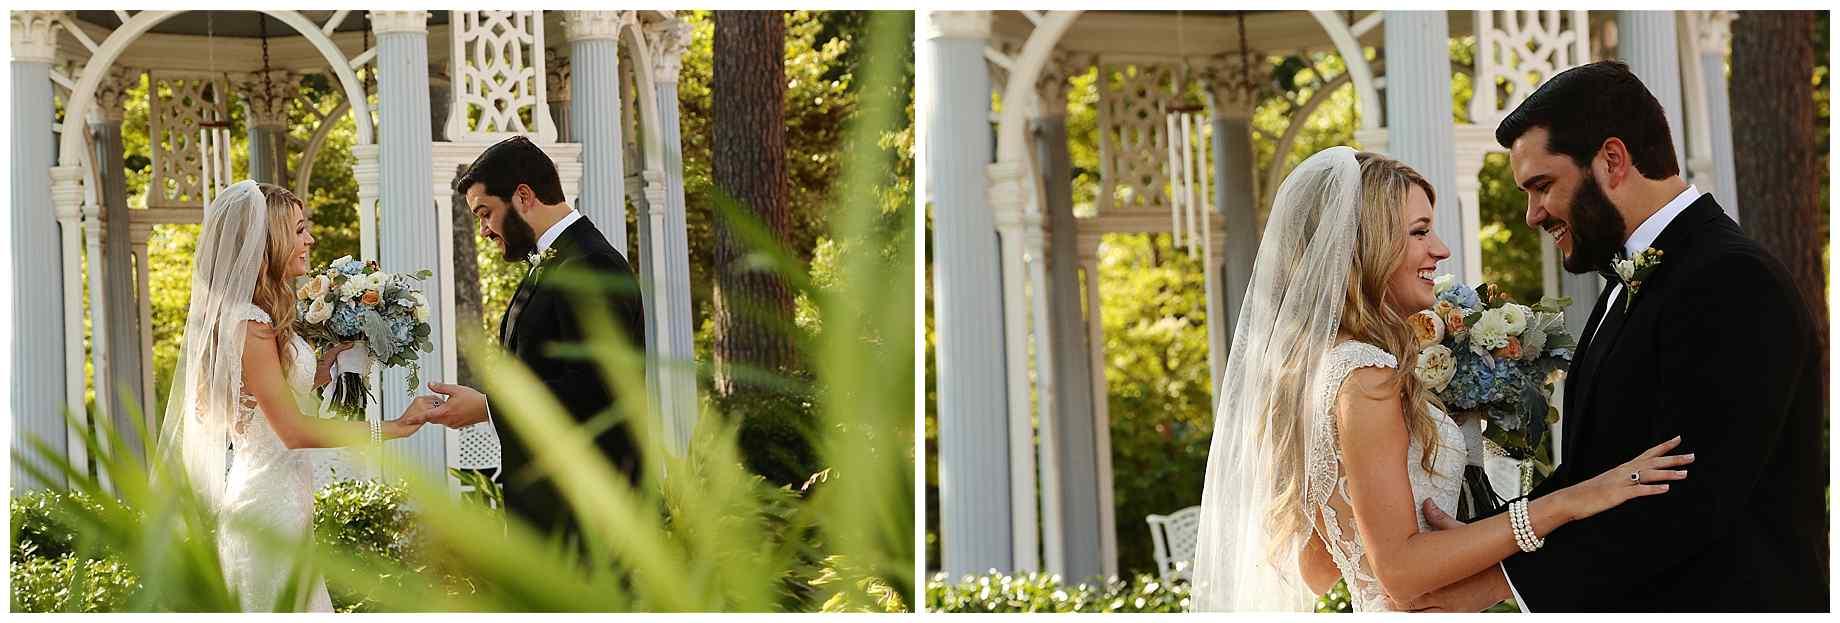 centenary-college-wedding-photos-shreveport-005